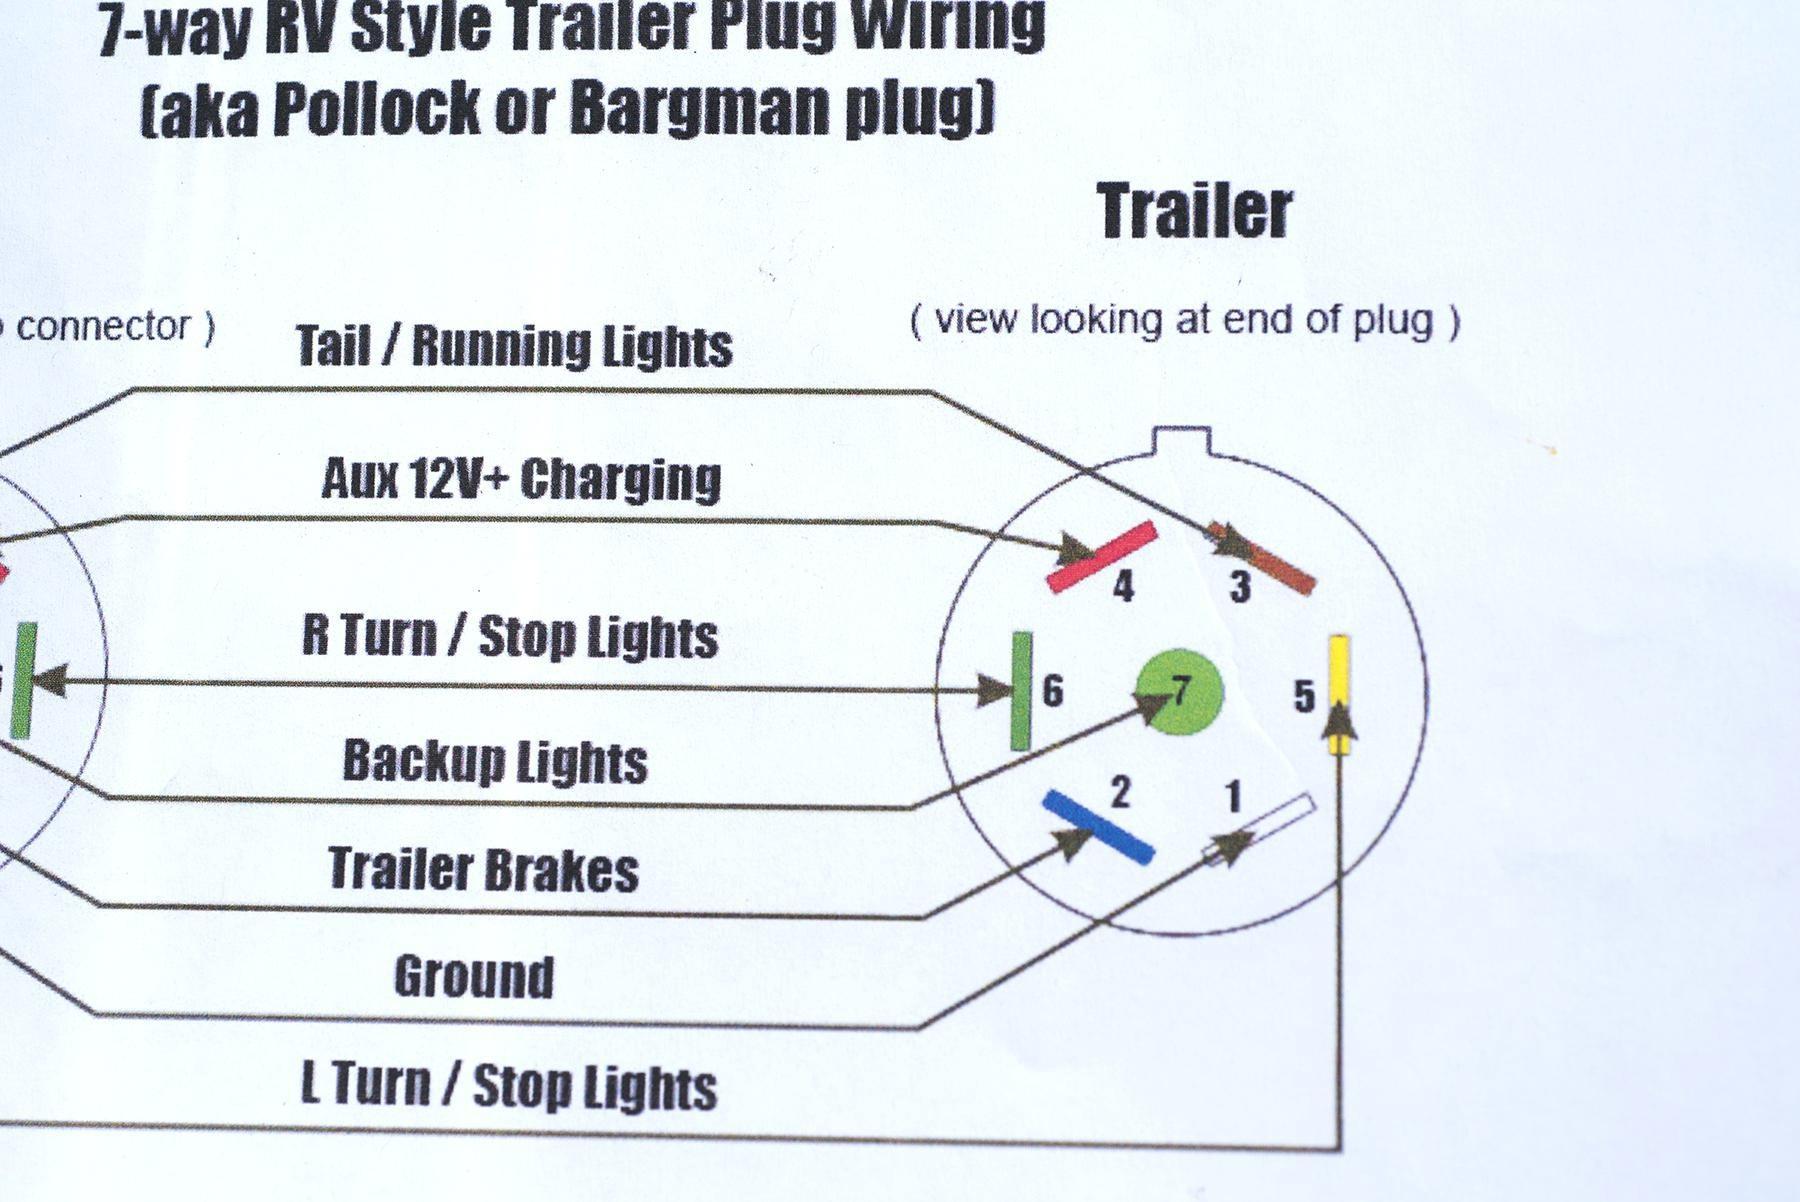 hight resolution of 7 way truck wiring diagram elegant trailer light wiring diagram diagram of 7 way truck wiring